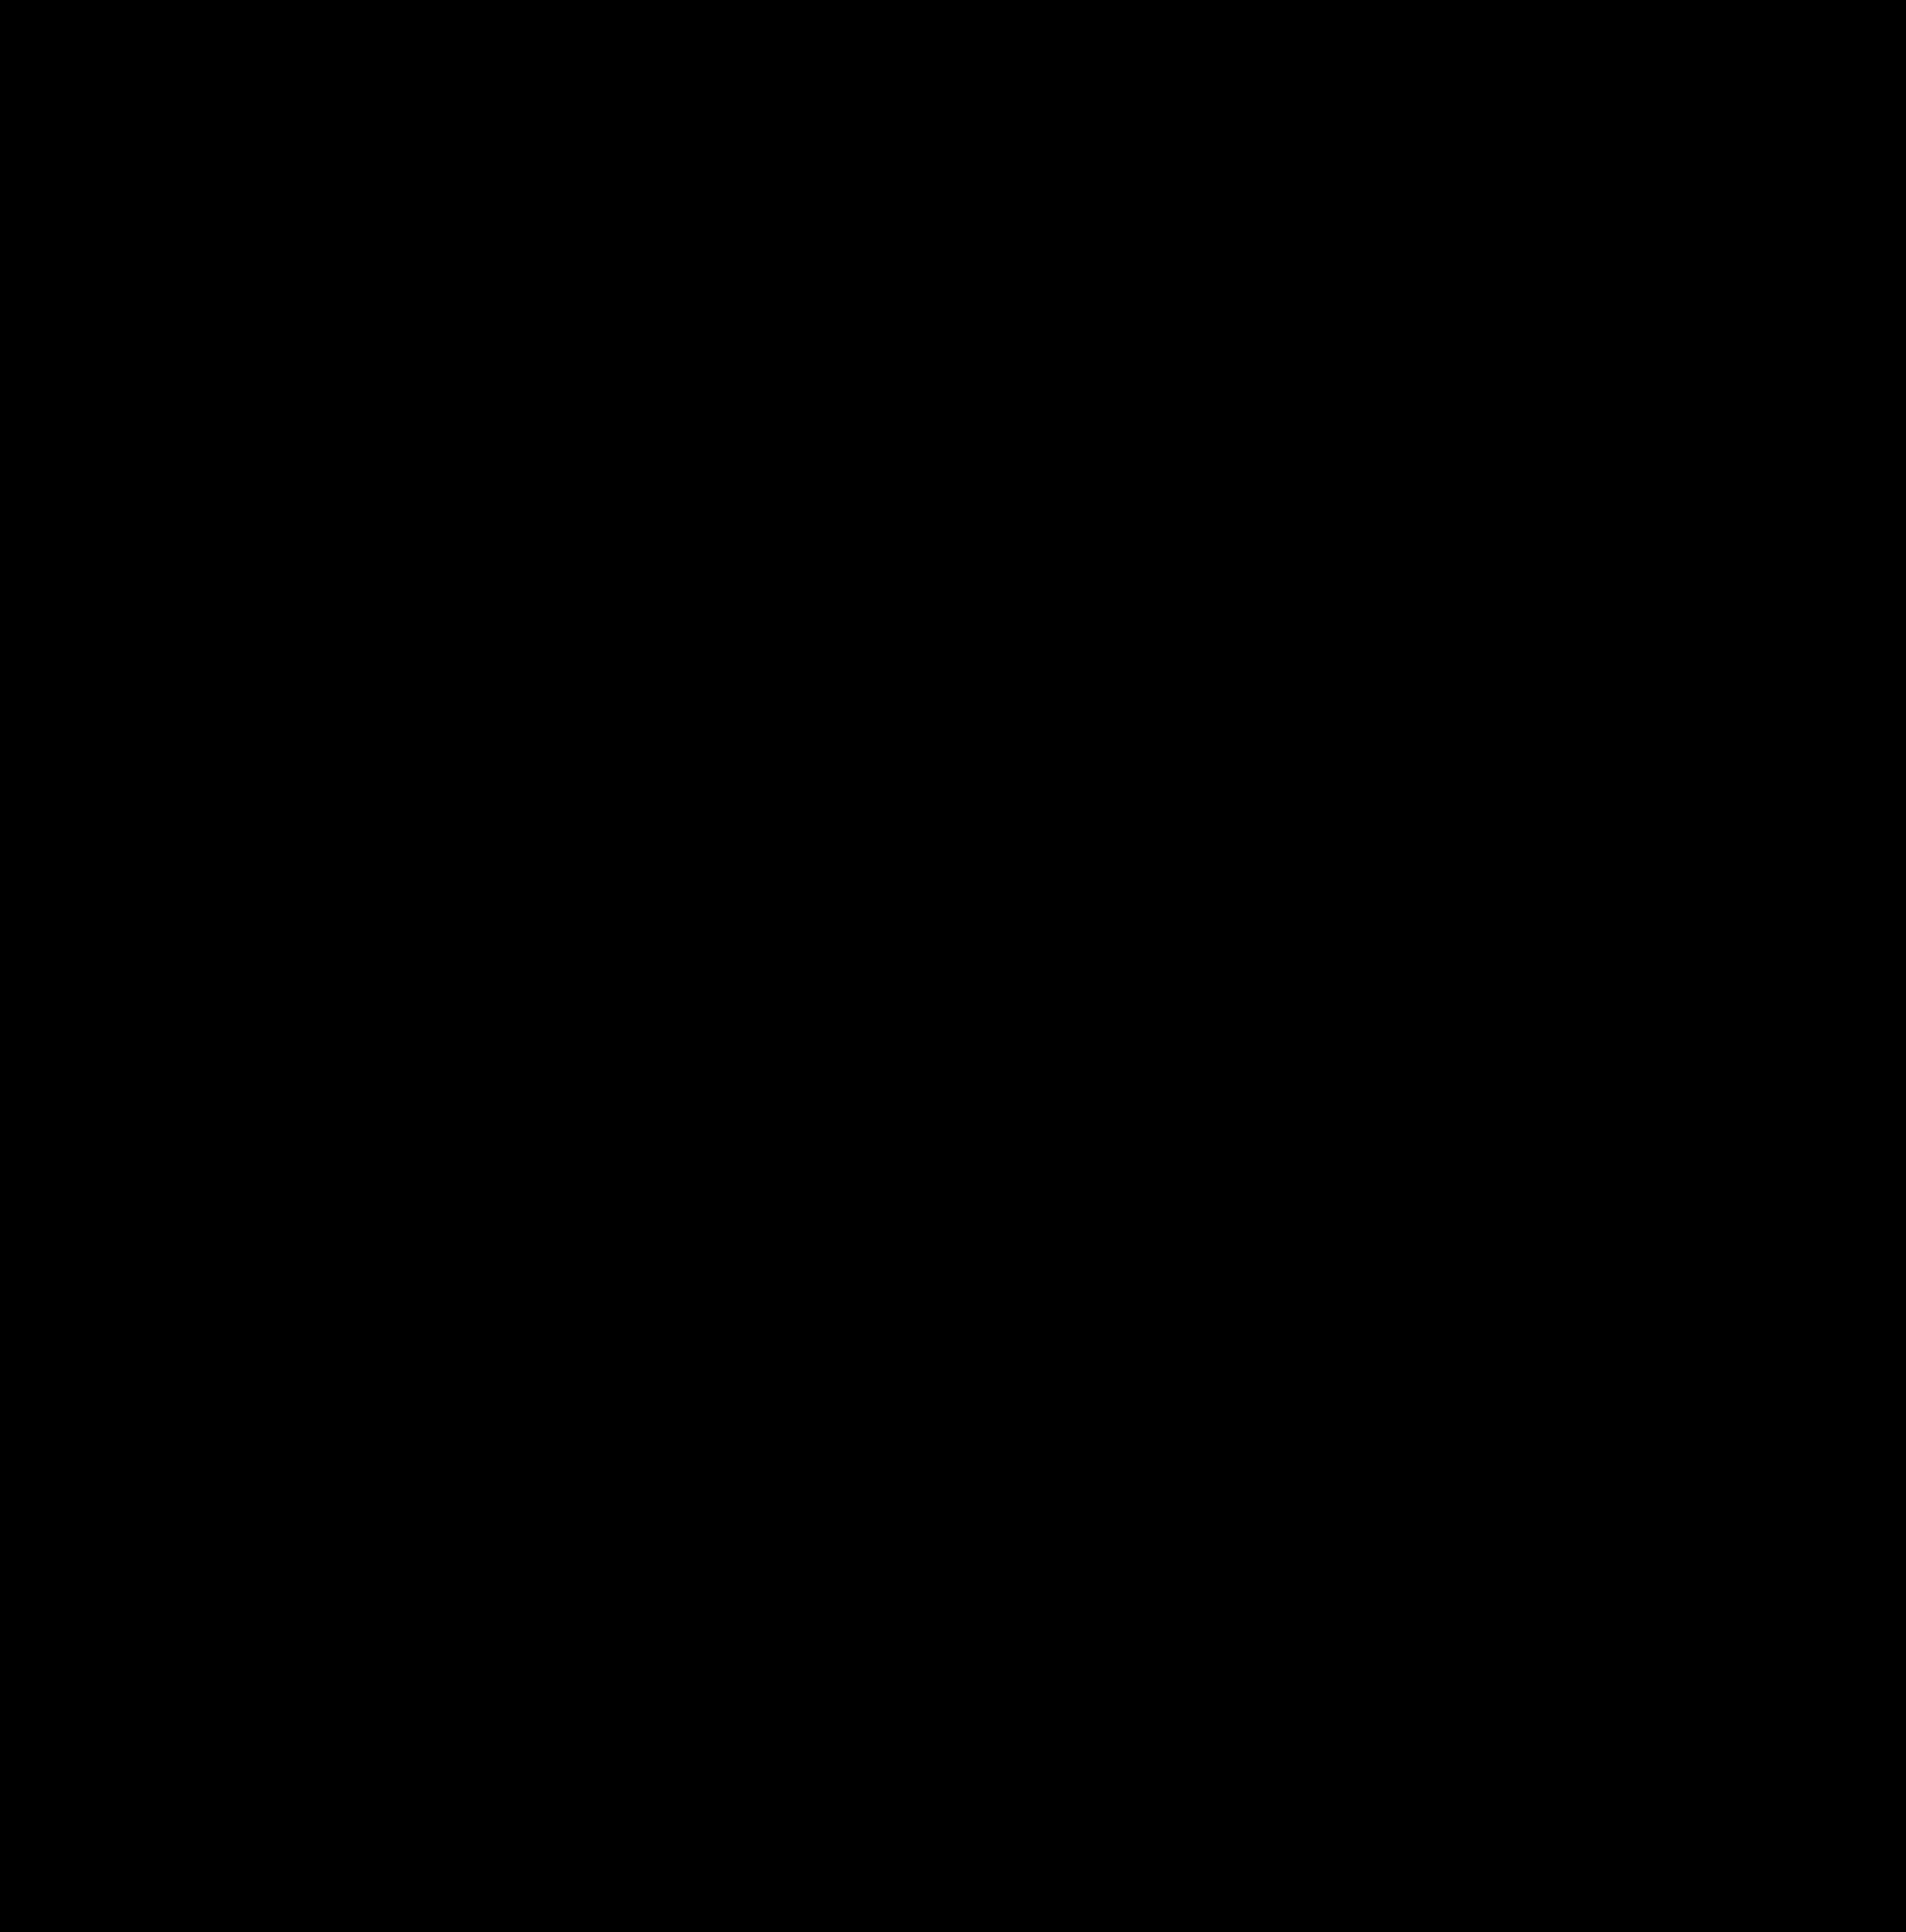 Drawn swirl silhouette Vector Flower Vector Free Clip